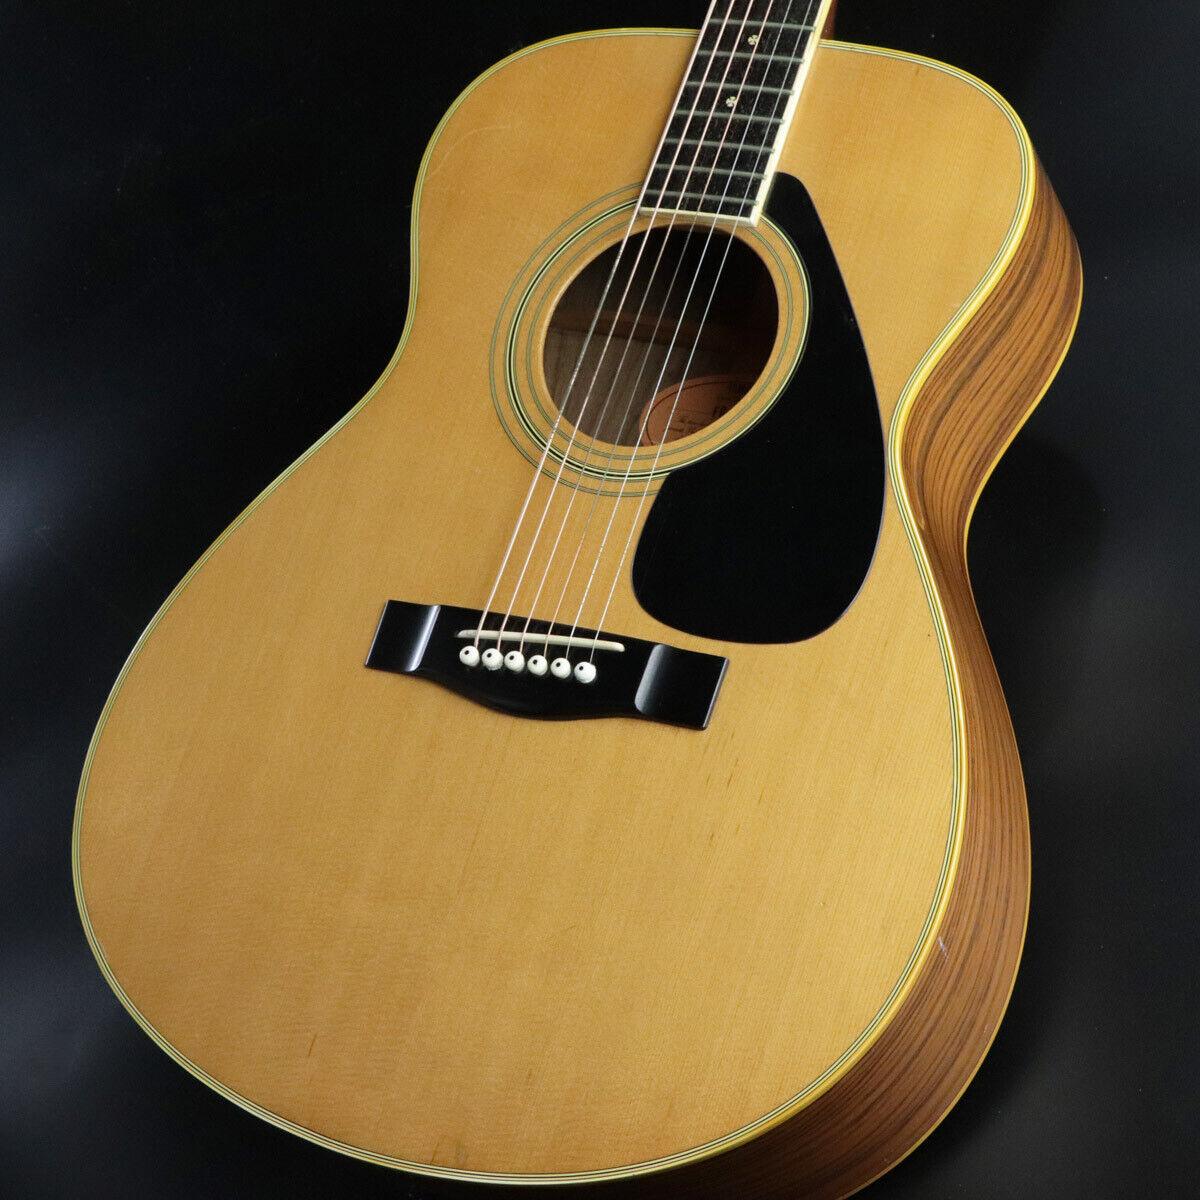 YAMAHA FG-302B acoustic guitar Japan rare beautiful vintage popular EMS F   S